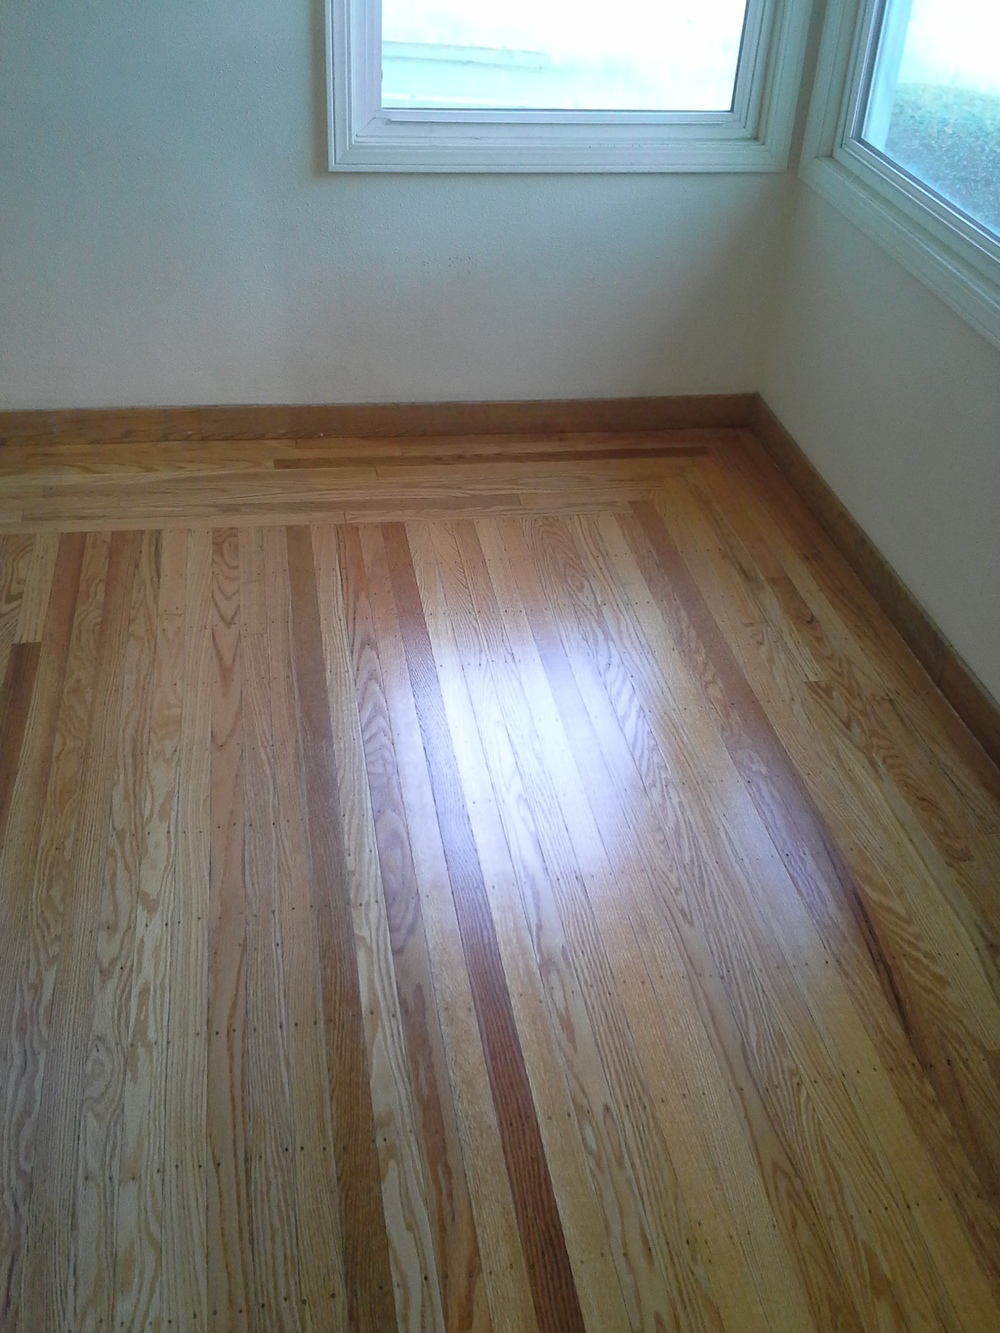 Floor photo.jpg